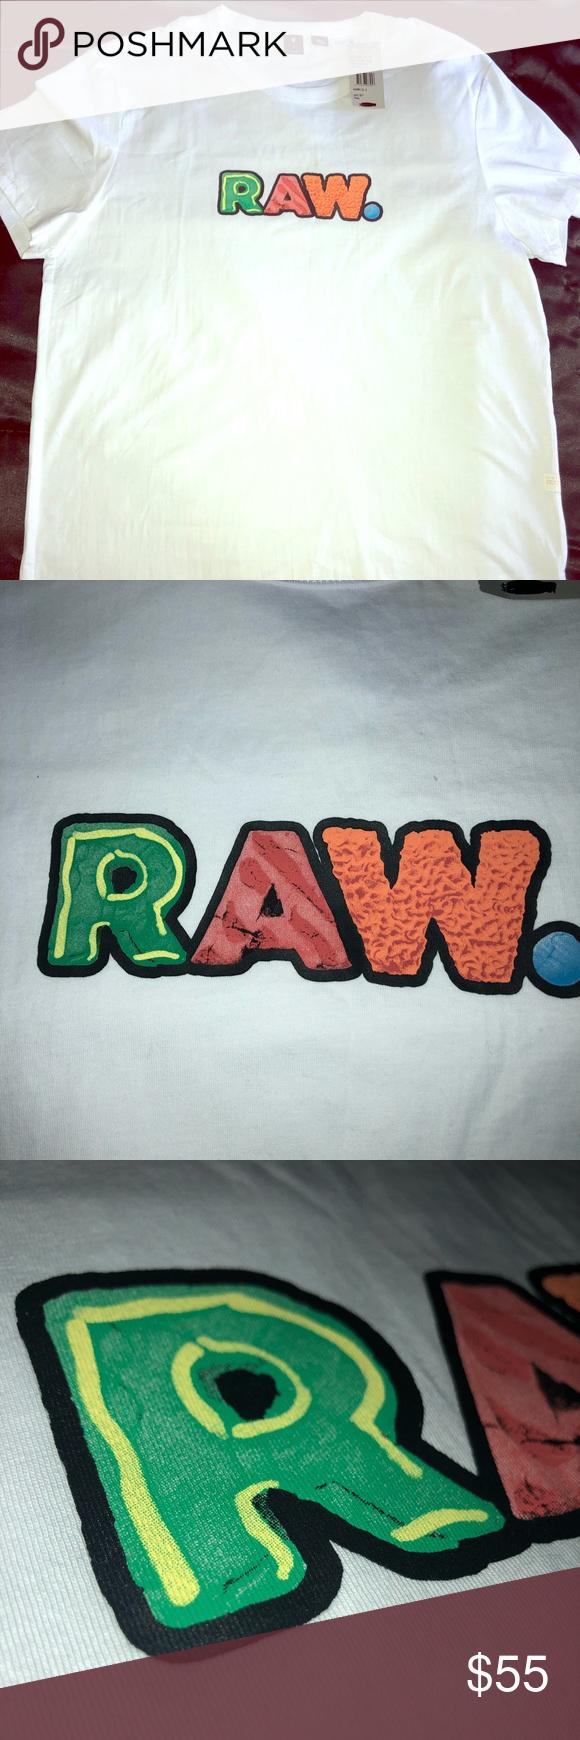 G Star Raw Delorean Graphic T Xl Nwt G Star G Star Raw Delorean